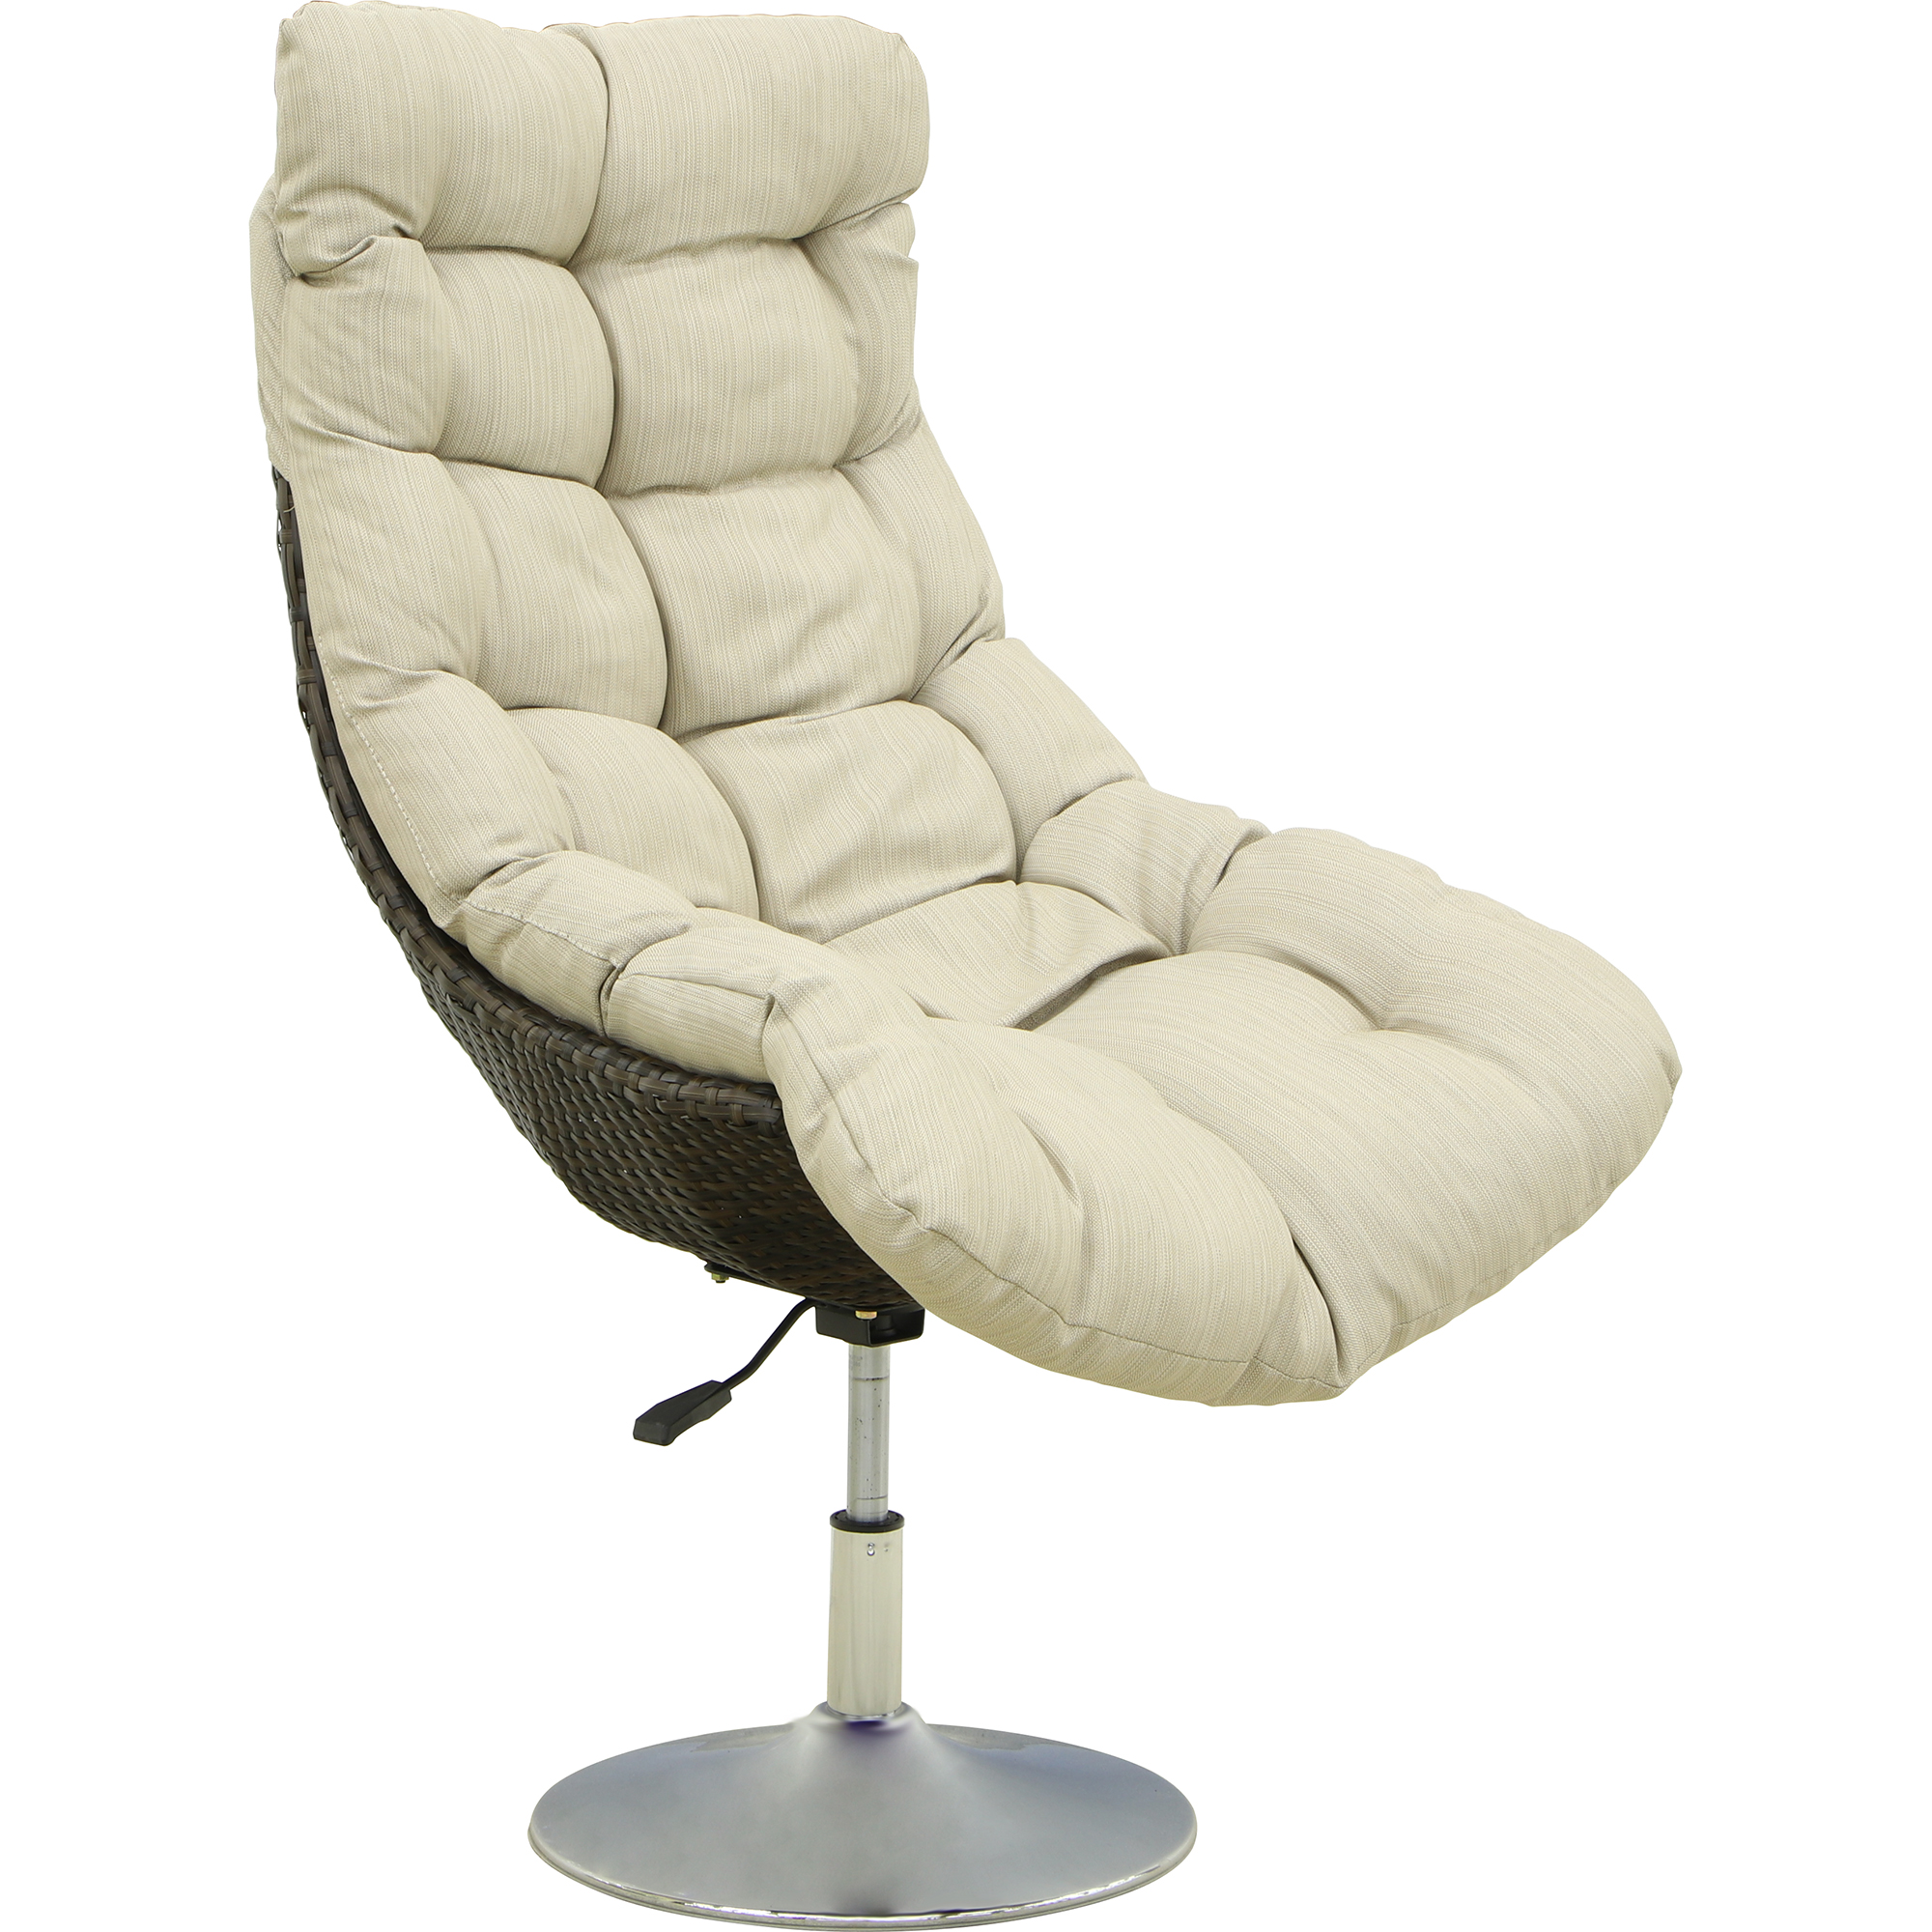 Фото - Кресло вращающееся Mavi rattan рубашка mavi 021235 620